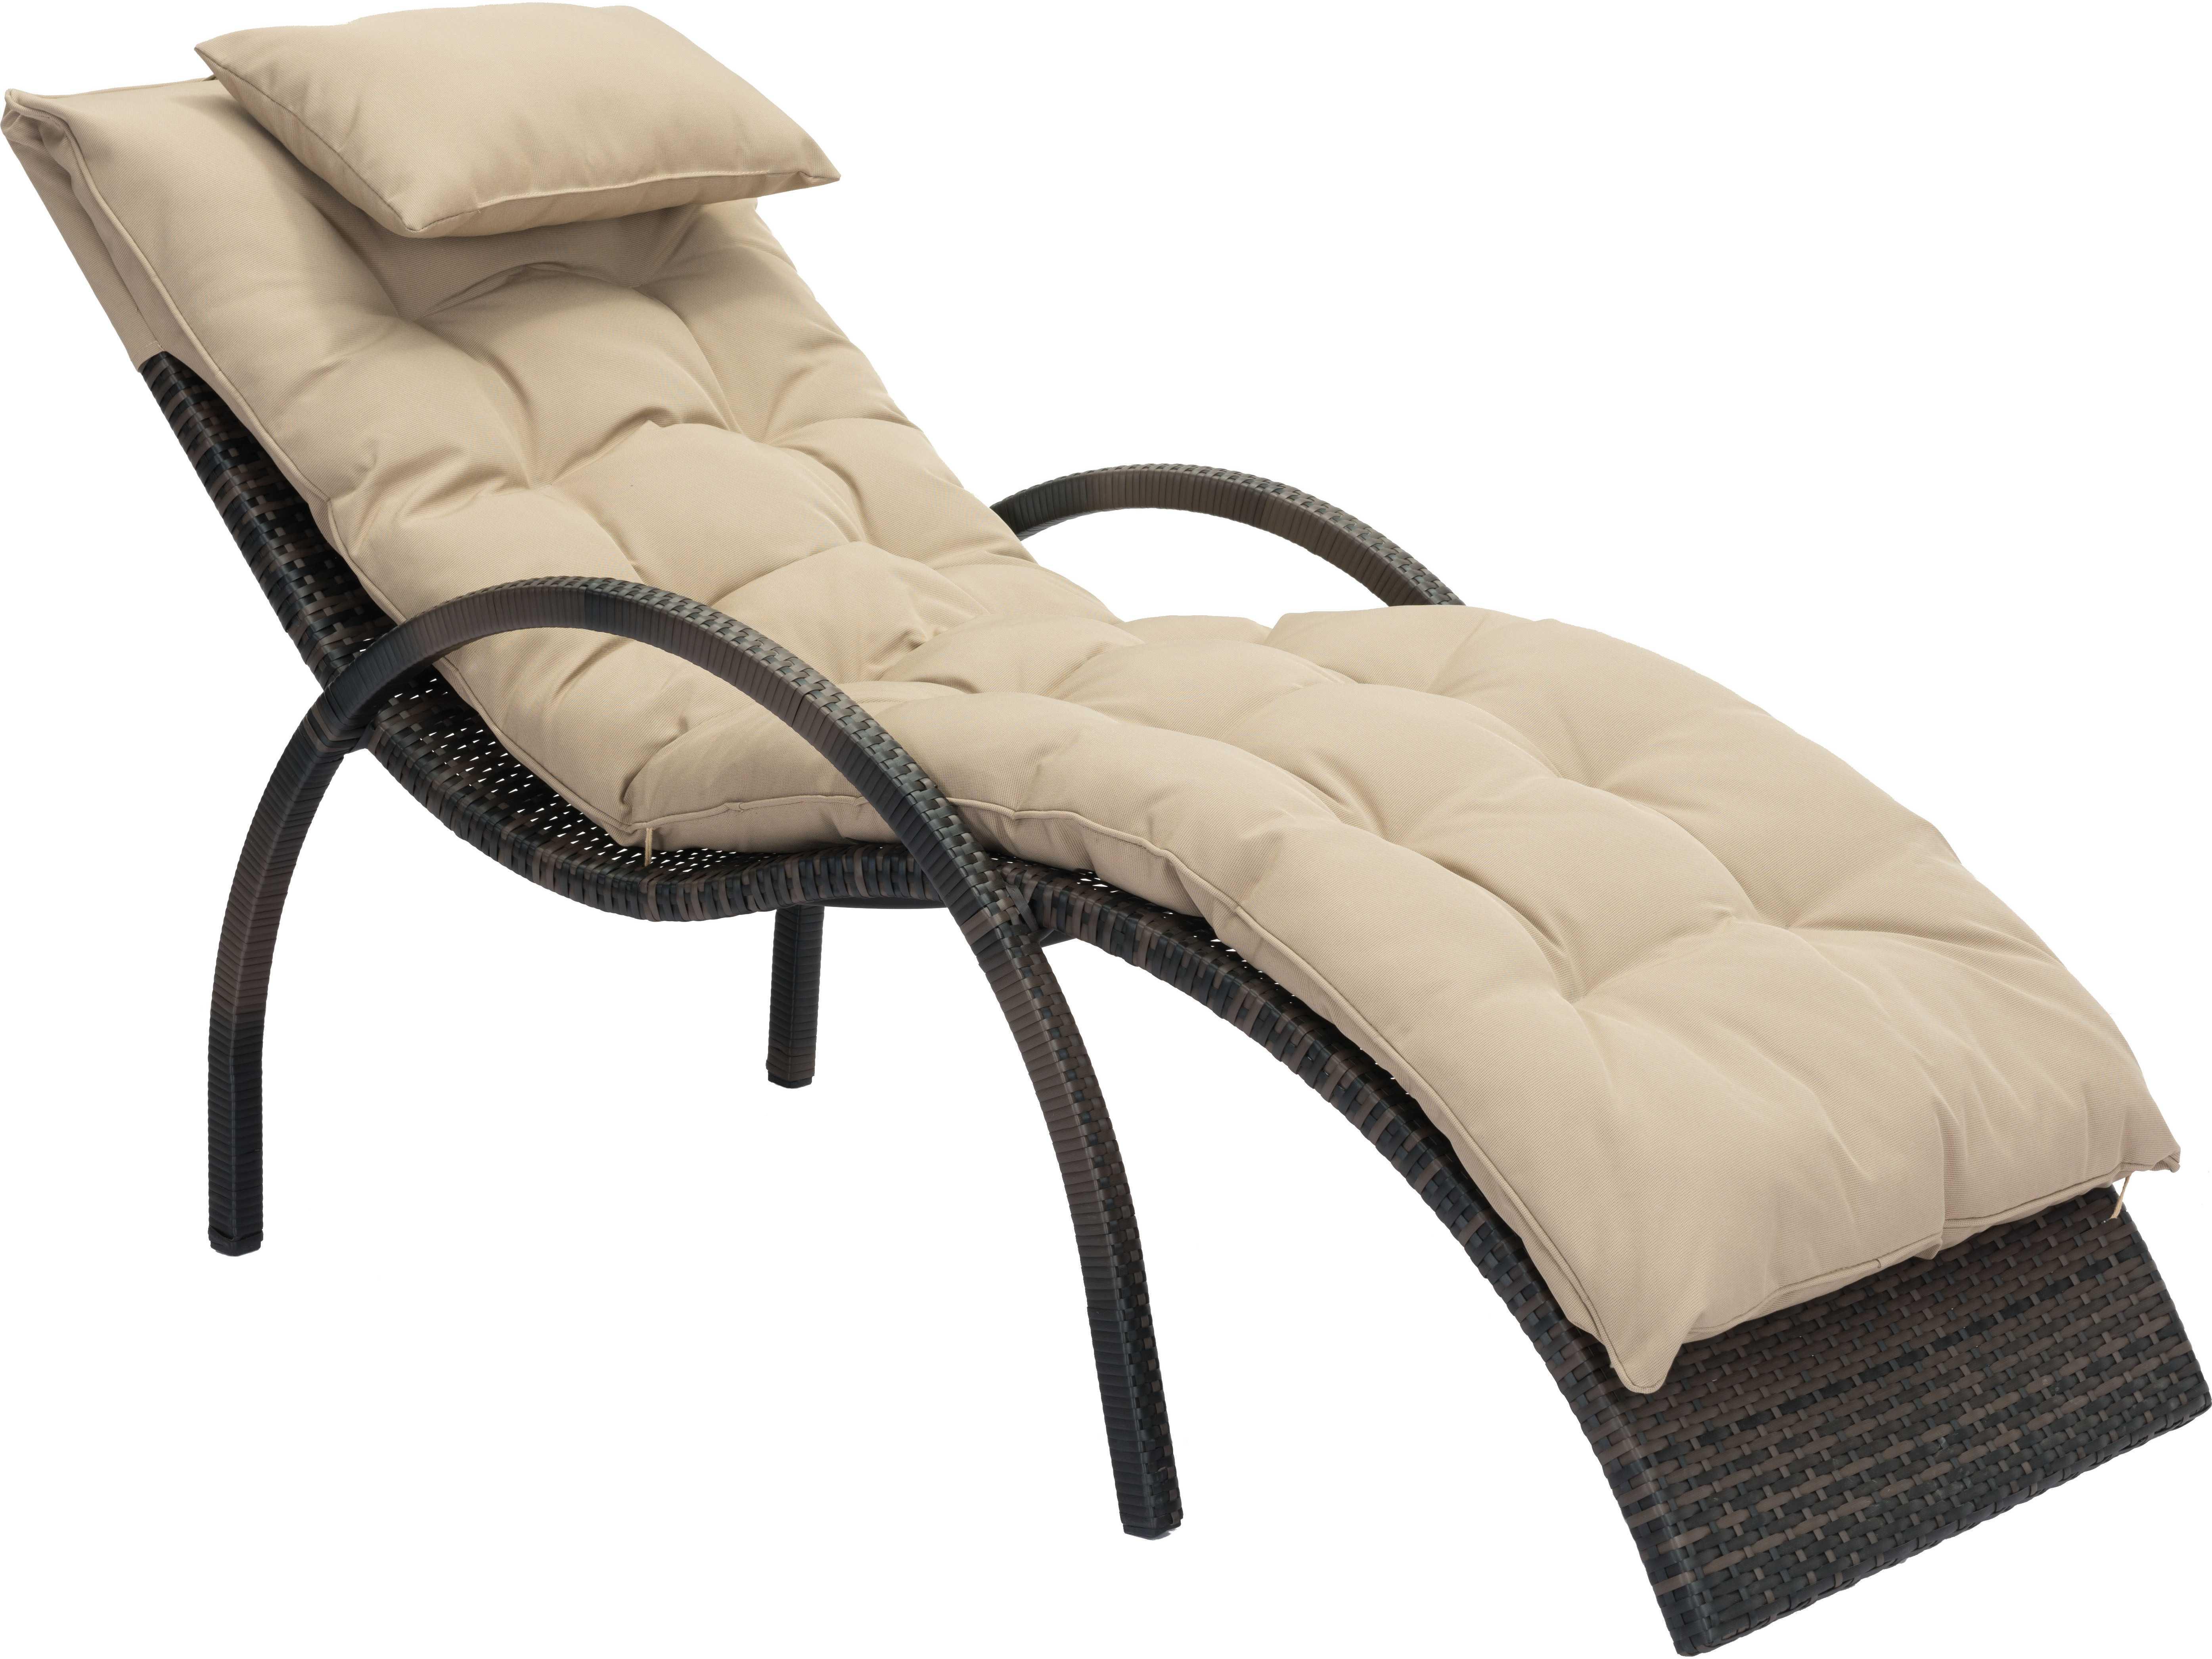 Zuo outdoor eggertz beach aluminum wicker beach chaise for Beach chaise lounges